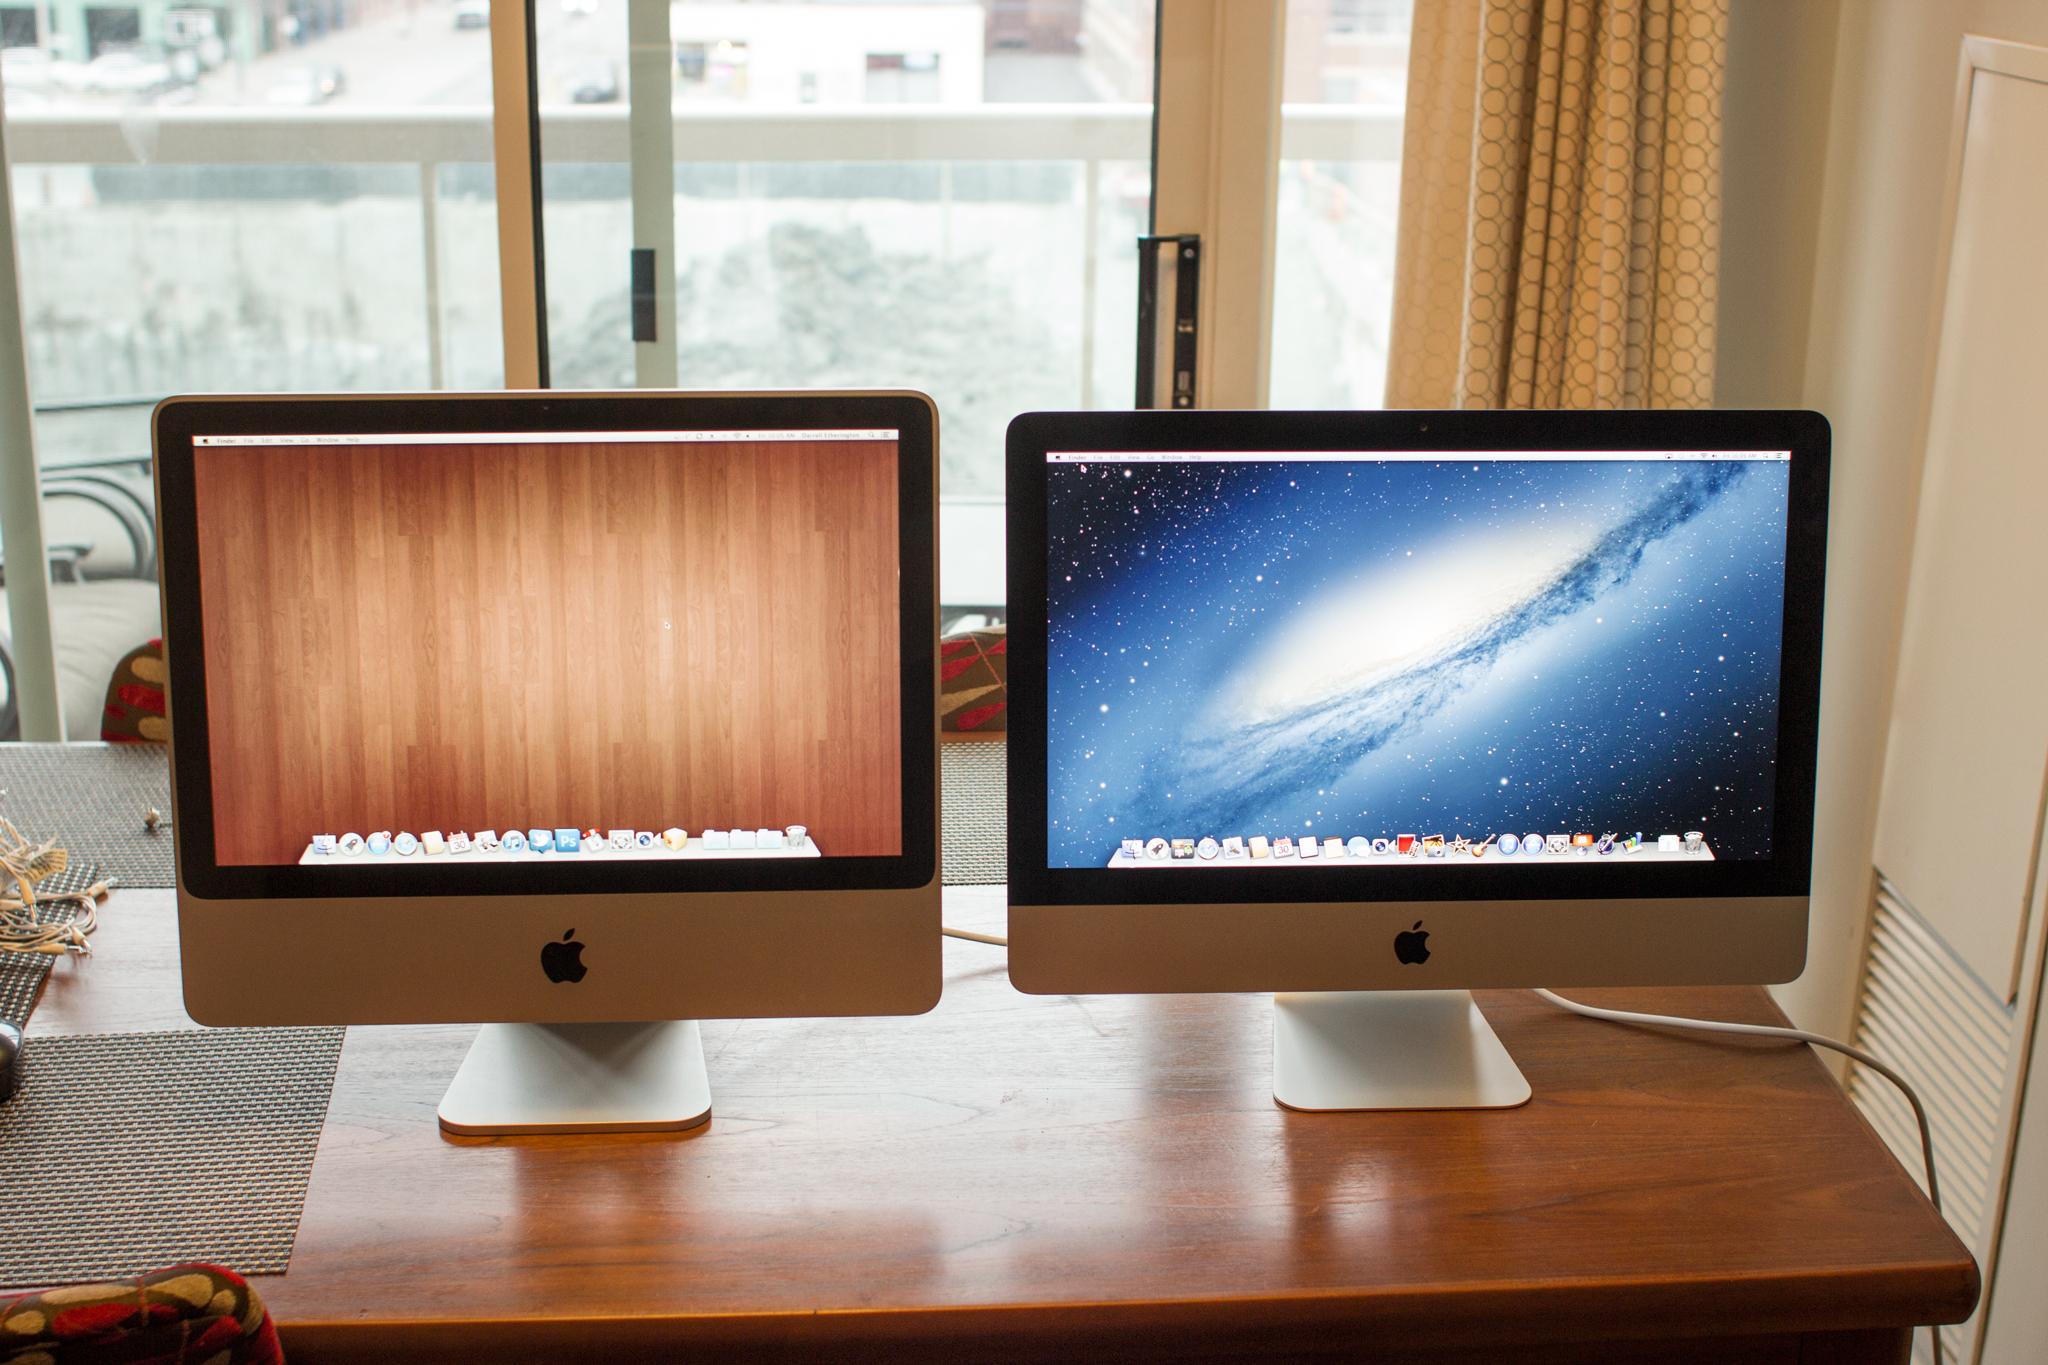 2008 20-inch iMac (left) next to 2012 21.5-inch iMac